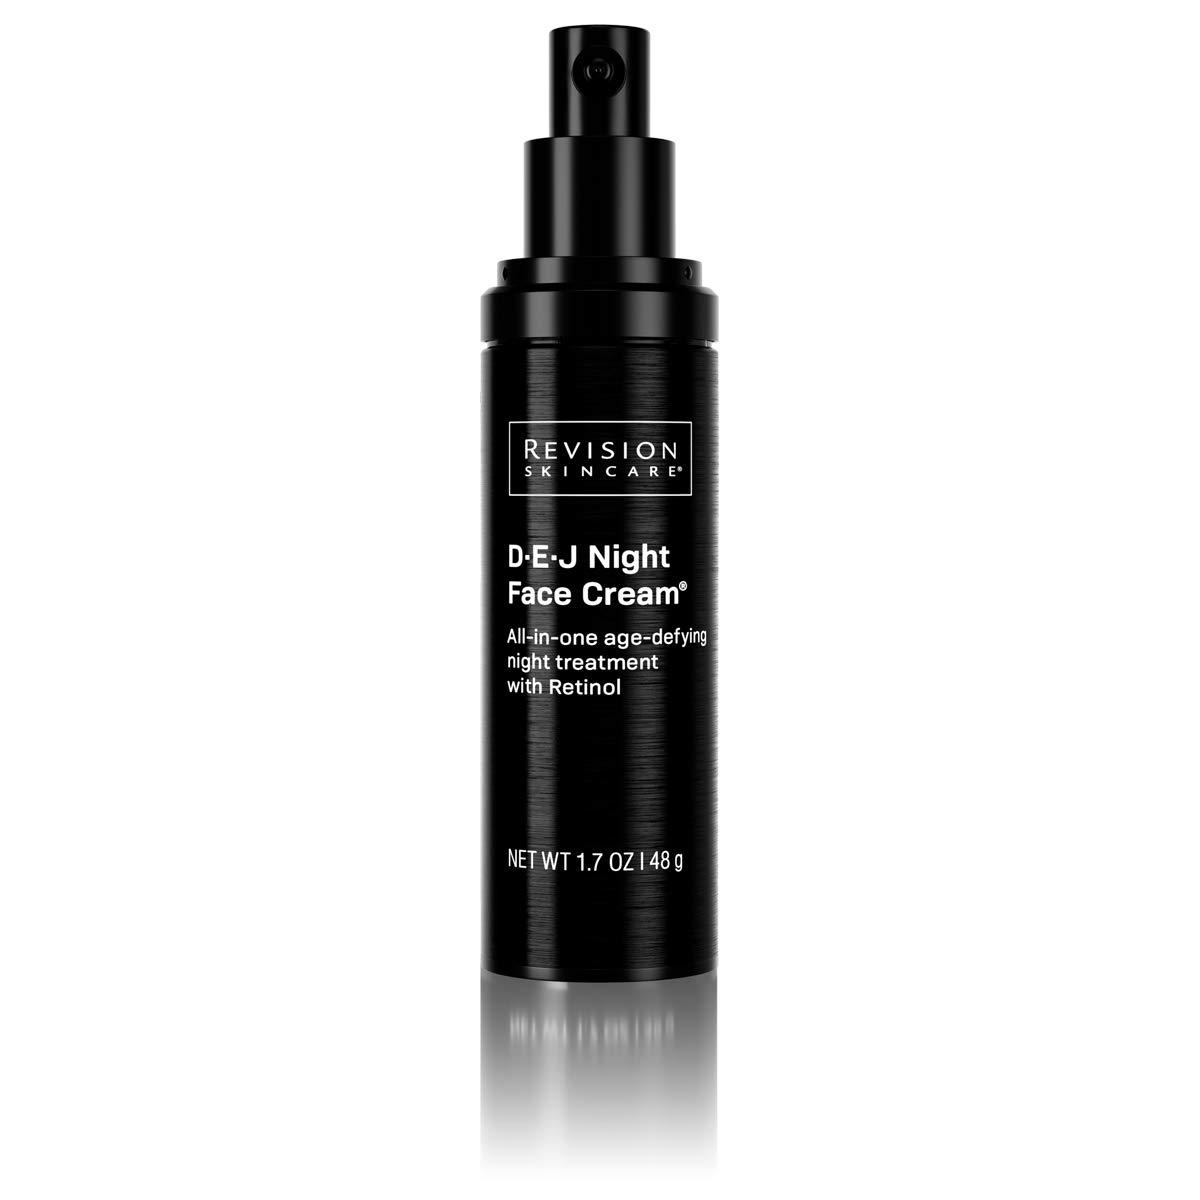 Revision Skincare D.E.J. Night Face Cream, 1.7 oz